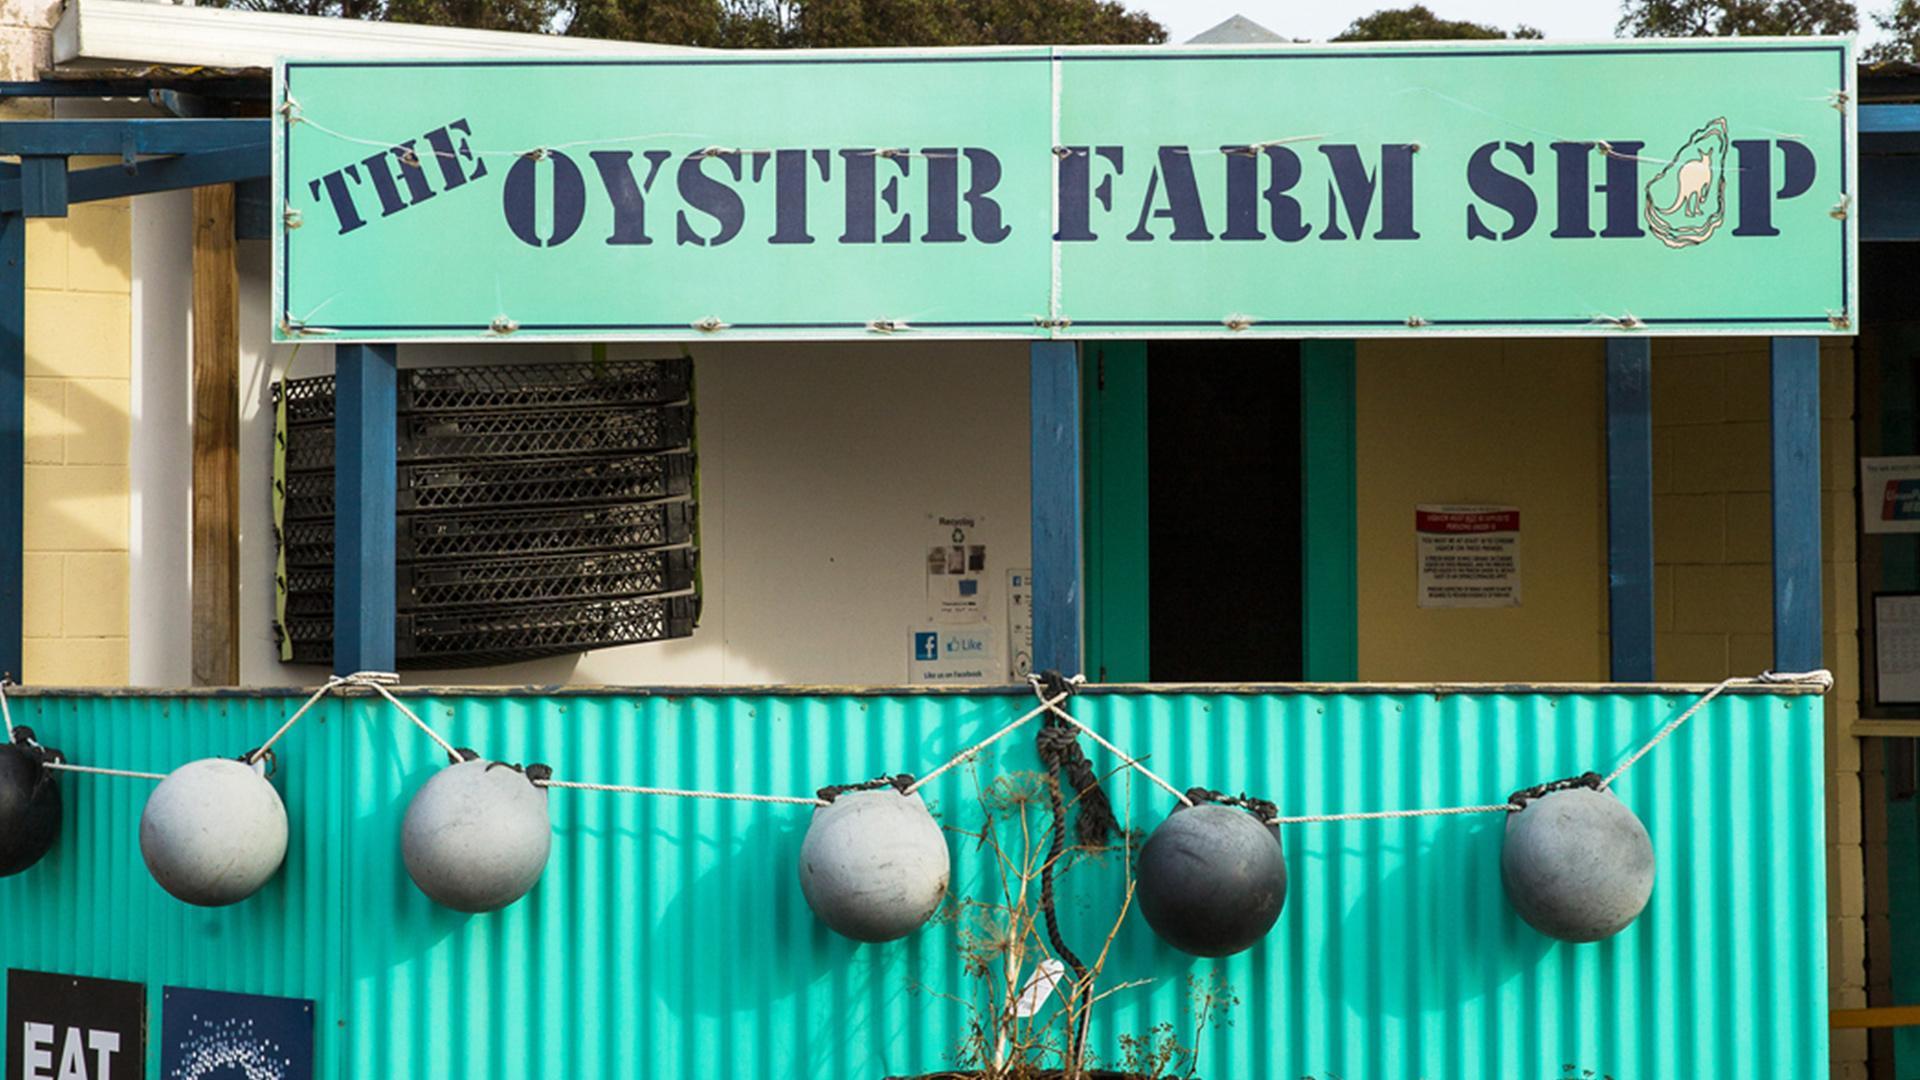 The Oyster Farm Shop